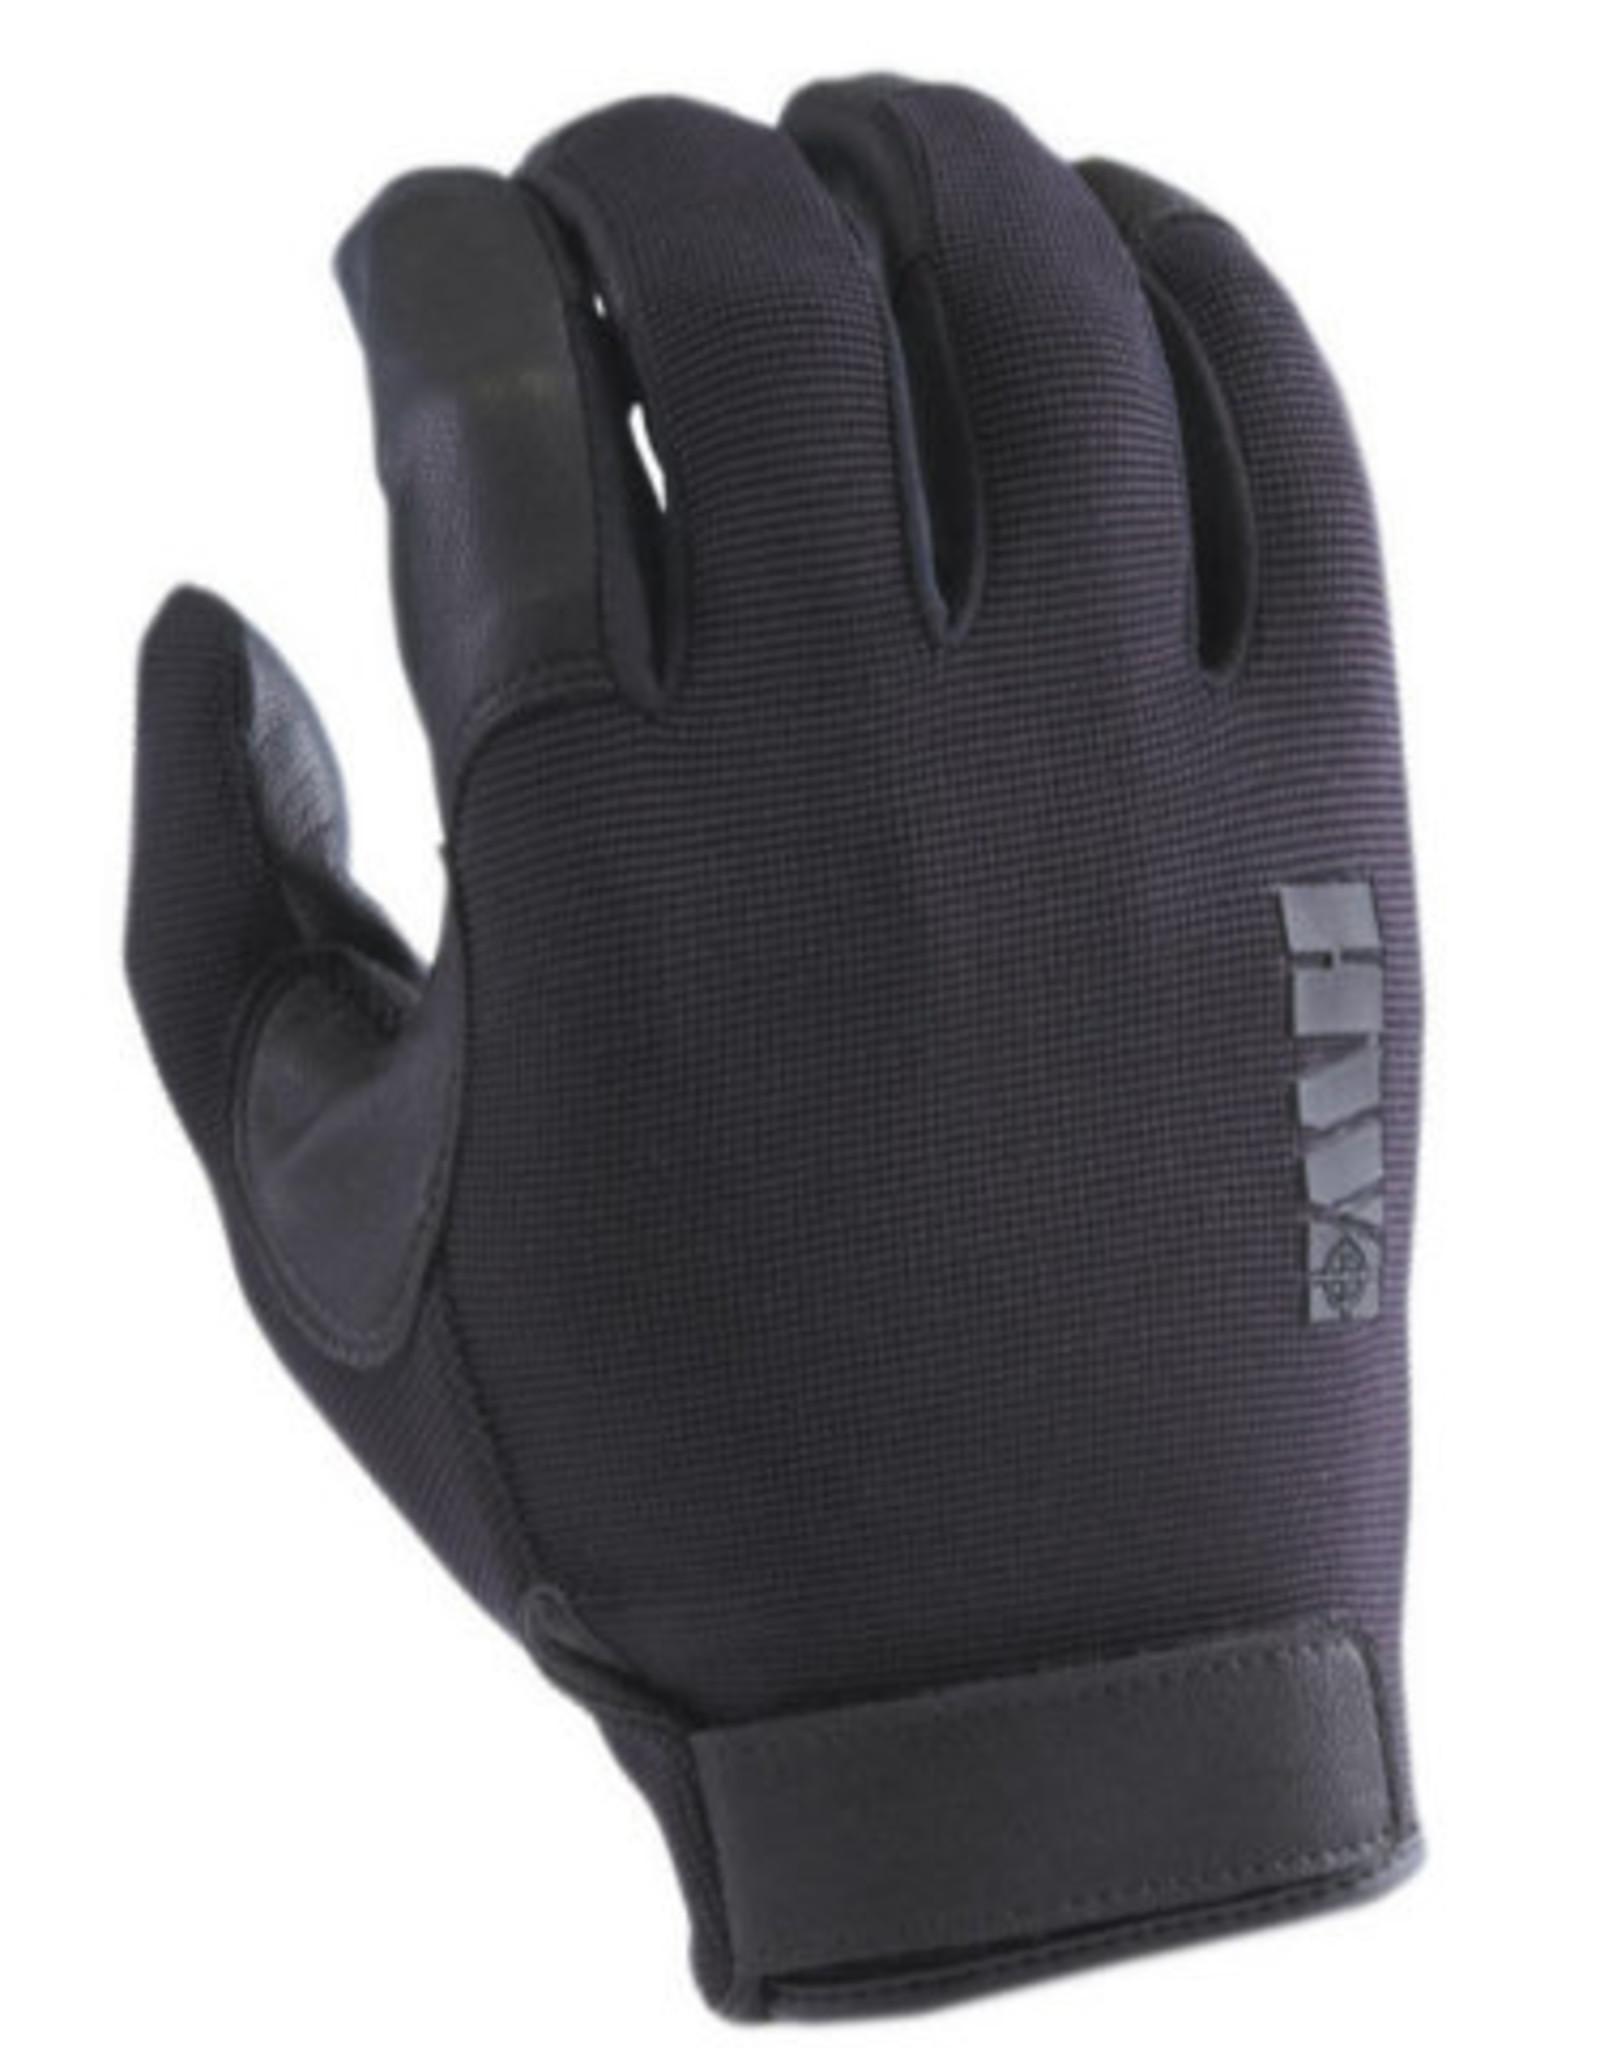 HWI TACTICAL & DUTY DESIGNS DLD100 Cut-Resistant Duty Glove